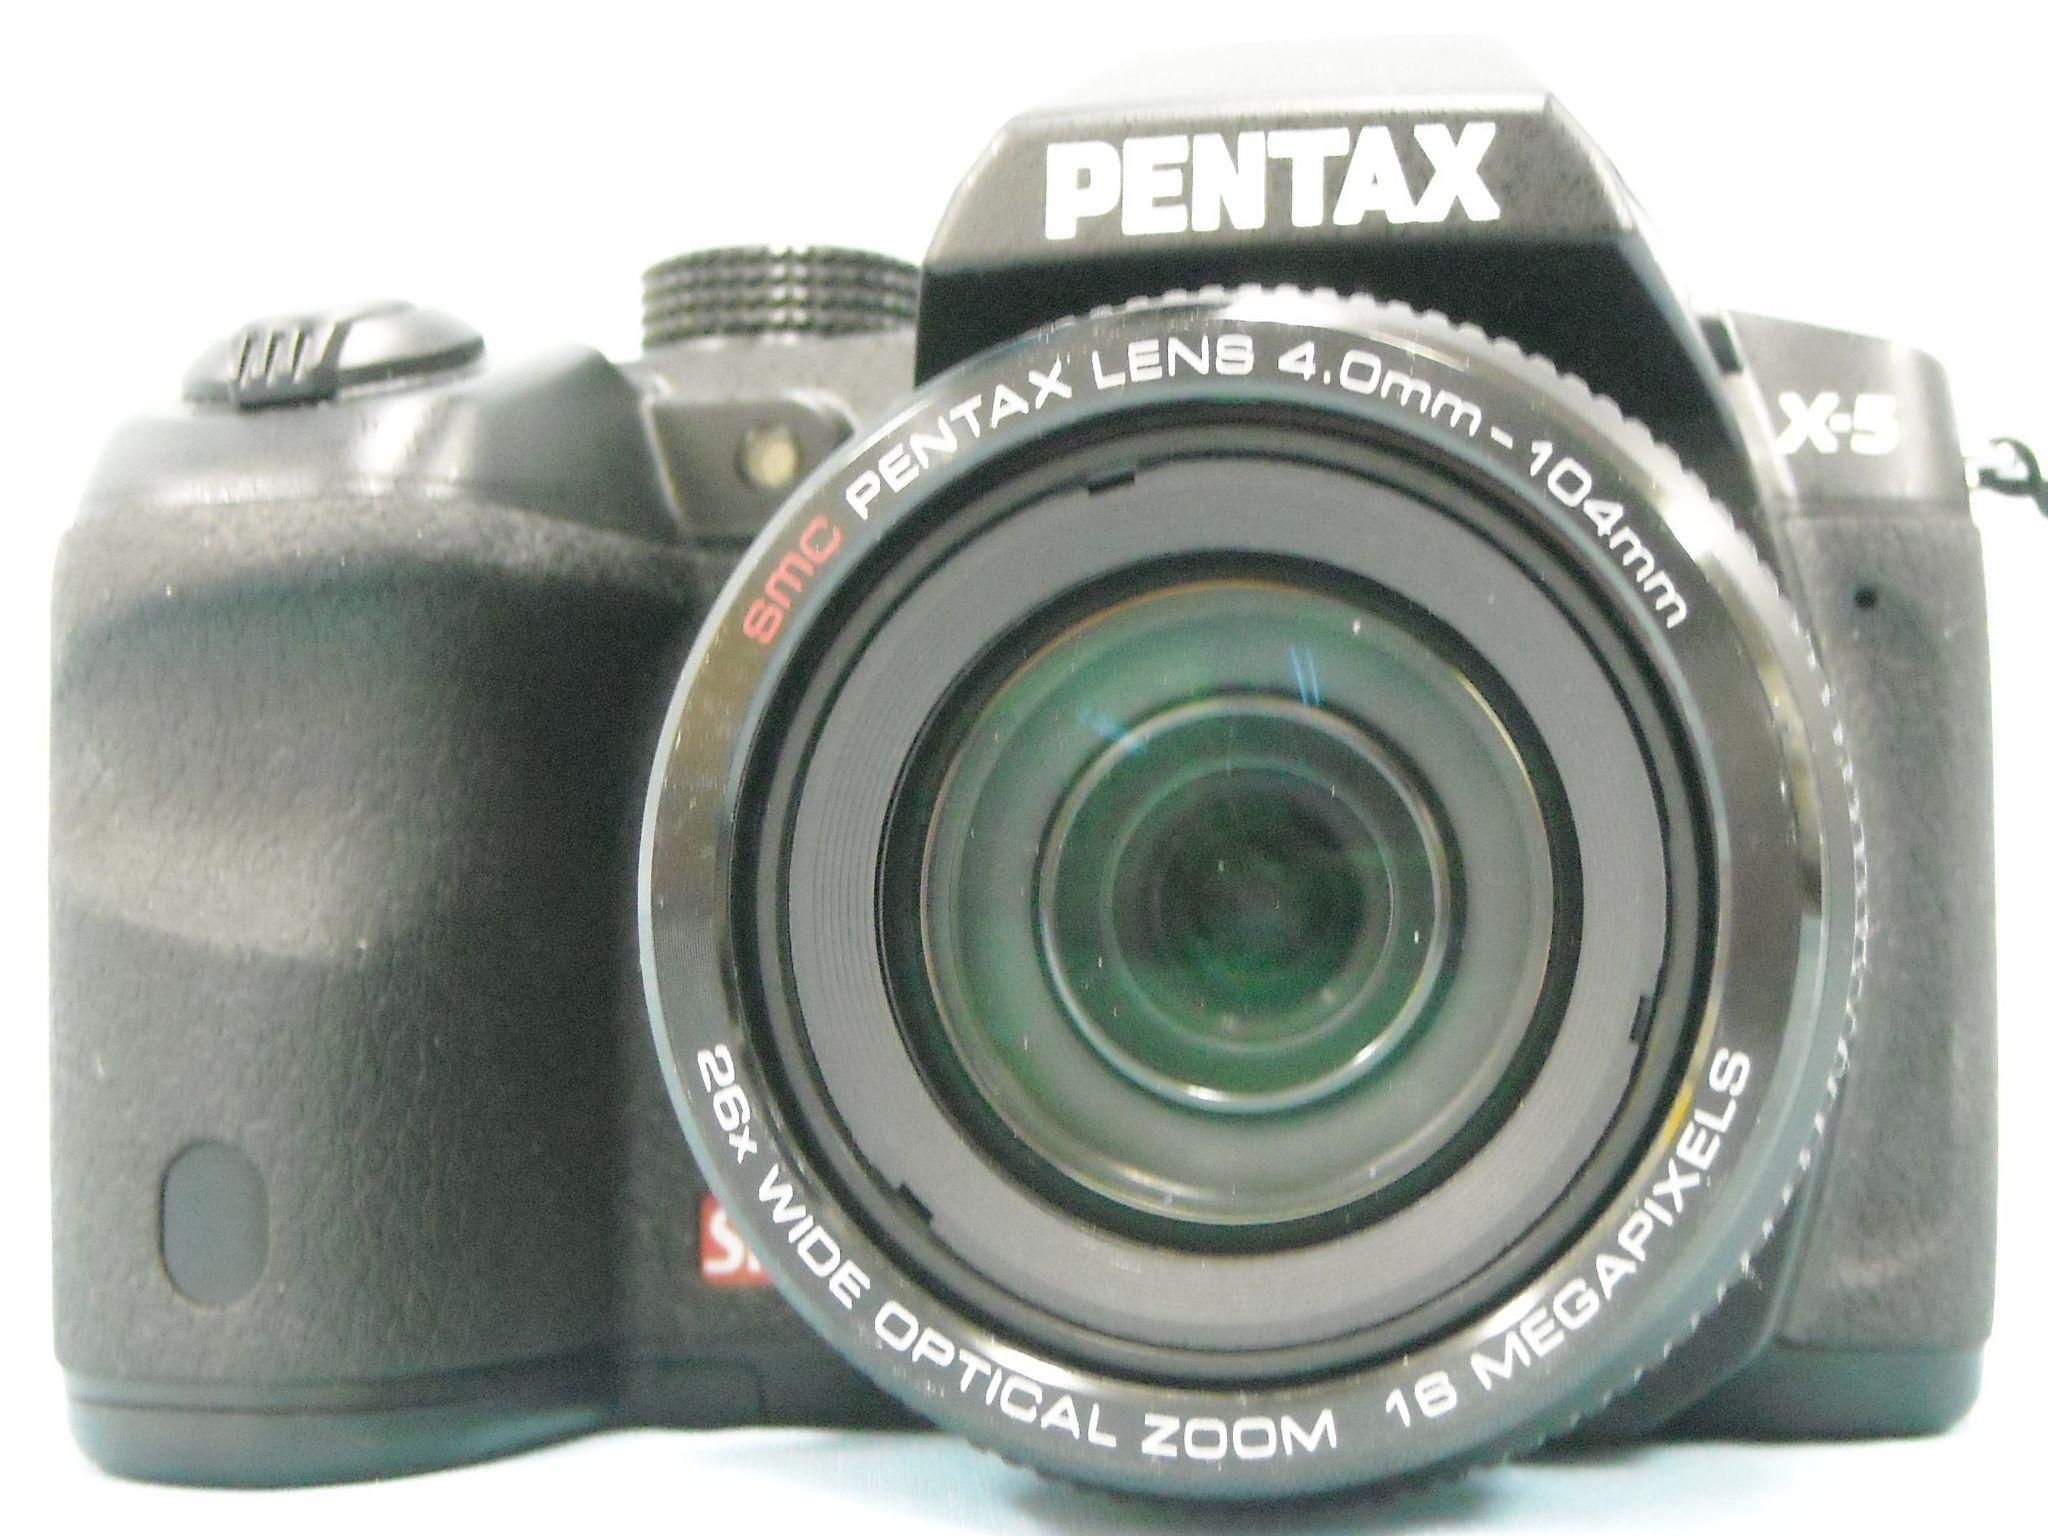 PENTAXデジタルカメラ買取|名古屋リサイクルショップ ハードオフ西尾